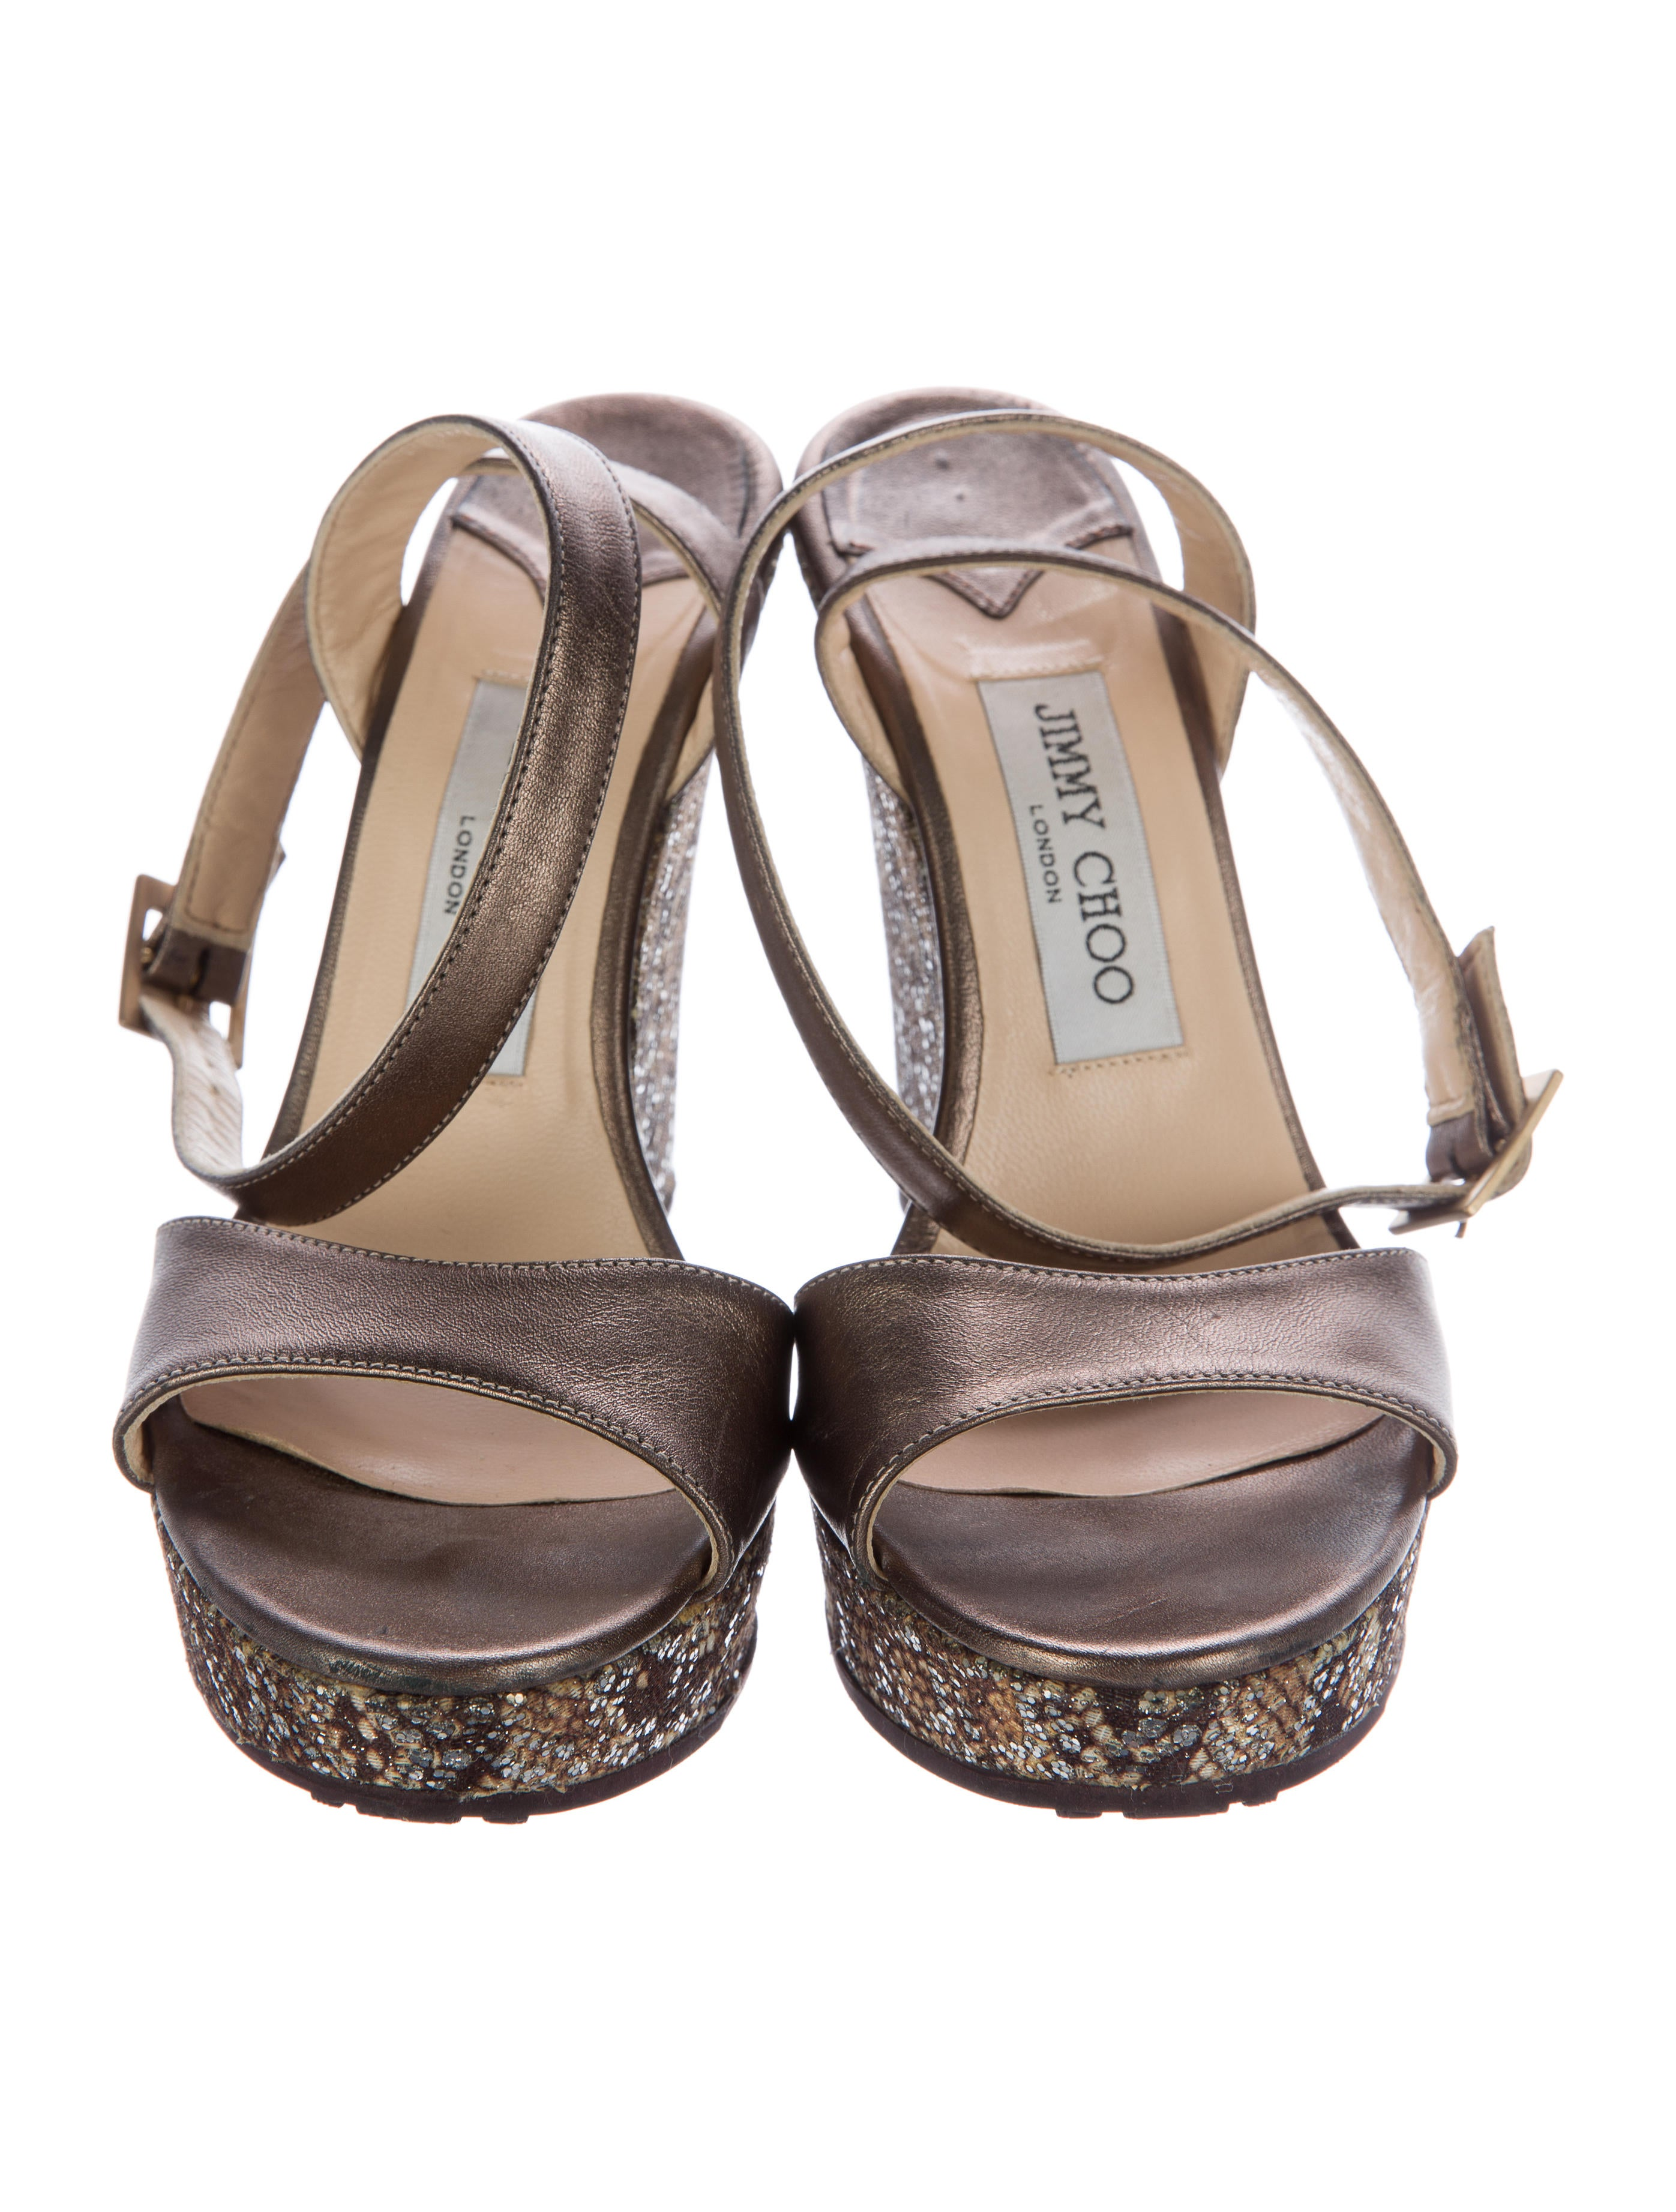 jimmy choo leather embellished wedges shoes jim69117